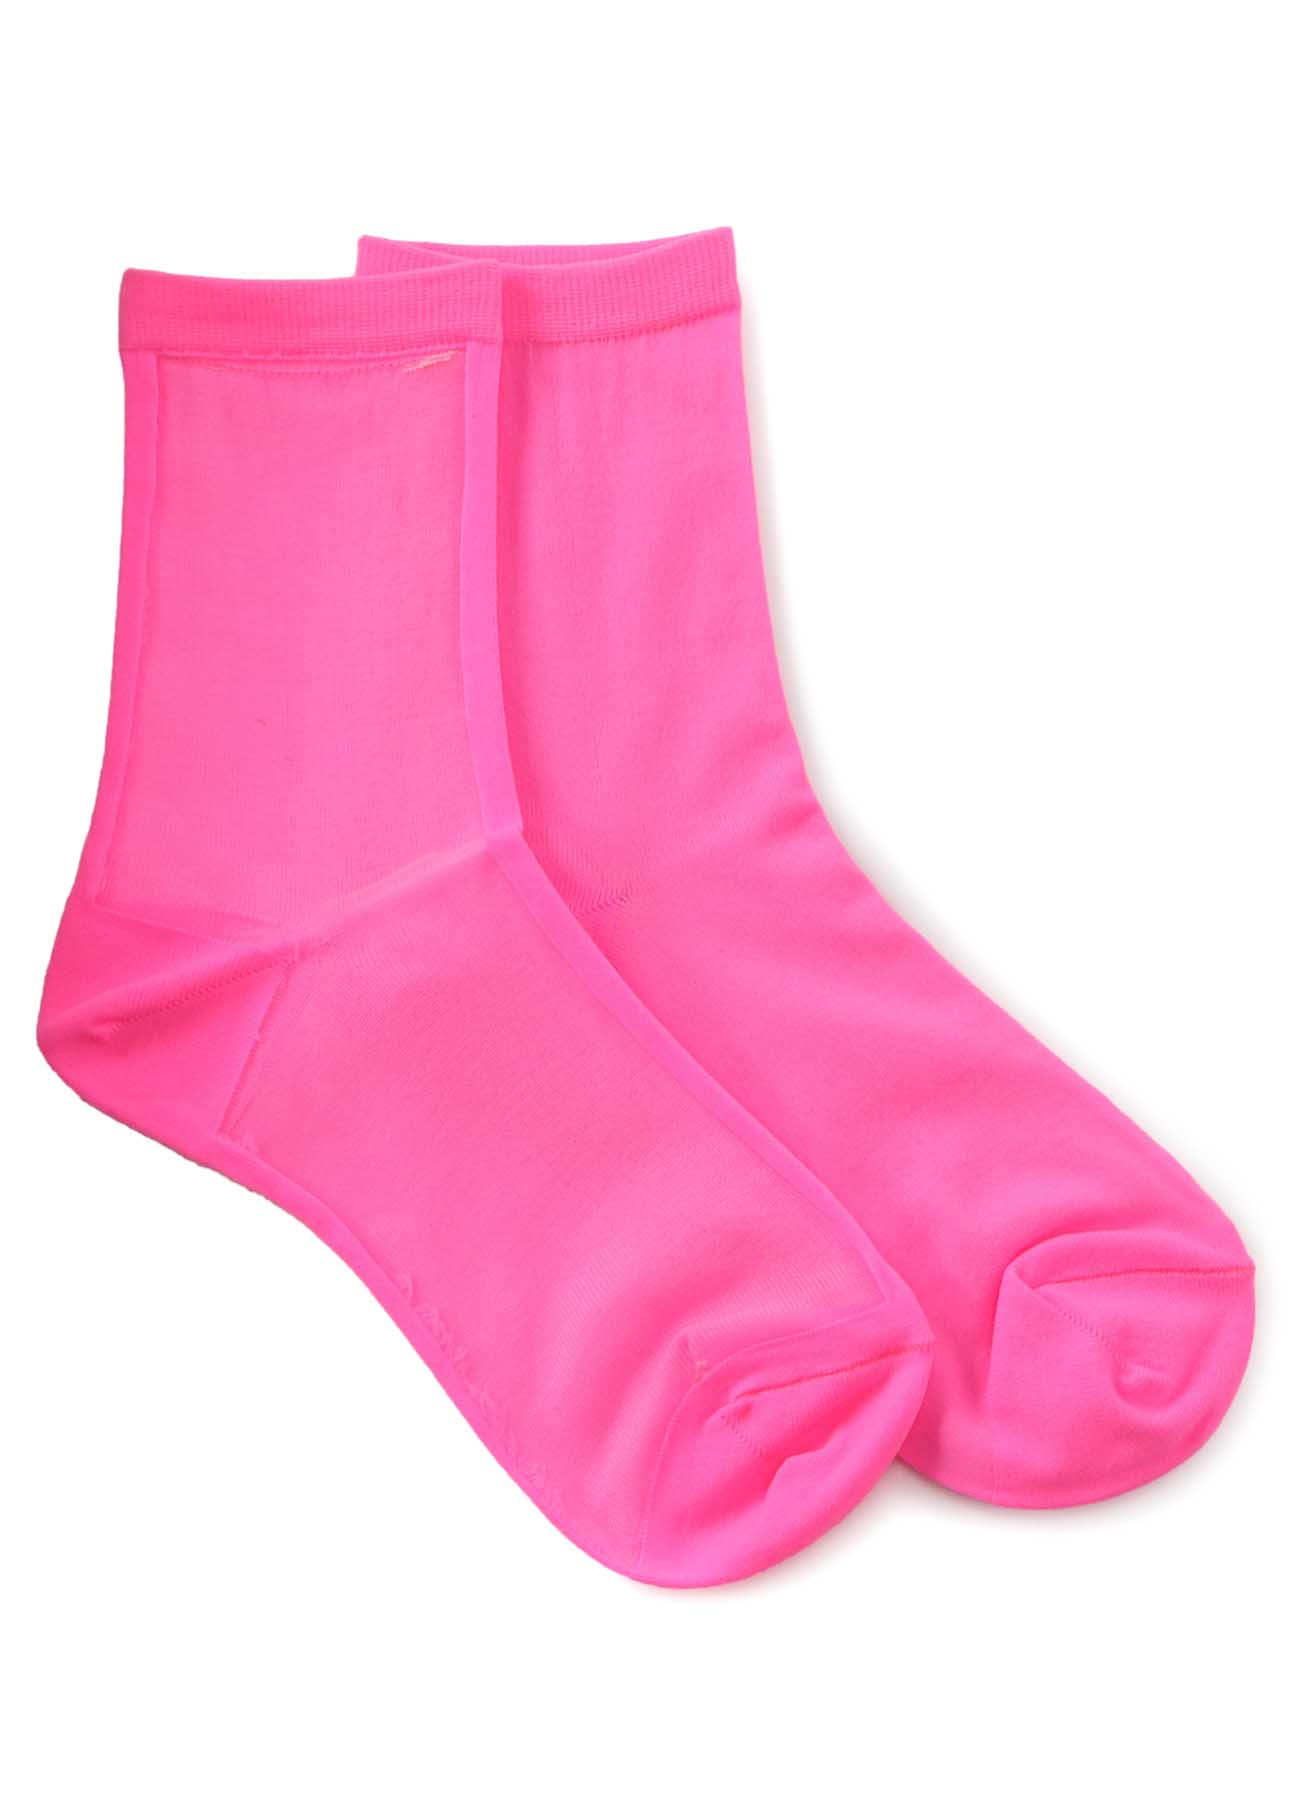 Ny/Pu Yarn Net Layered Socks